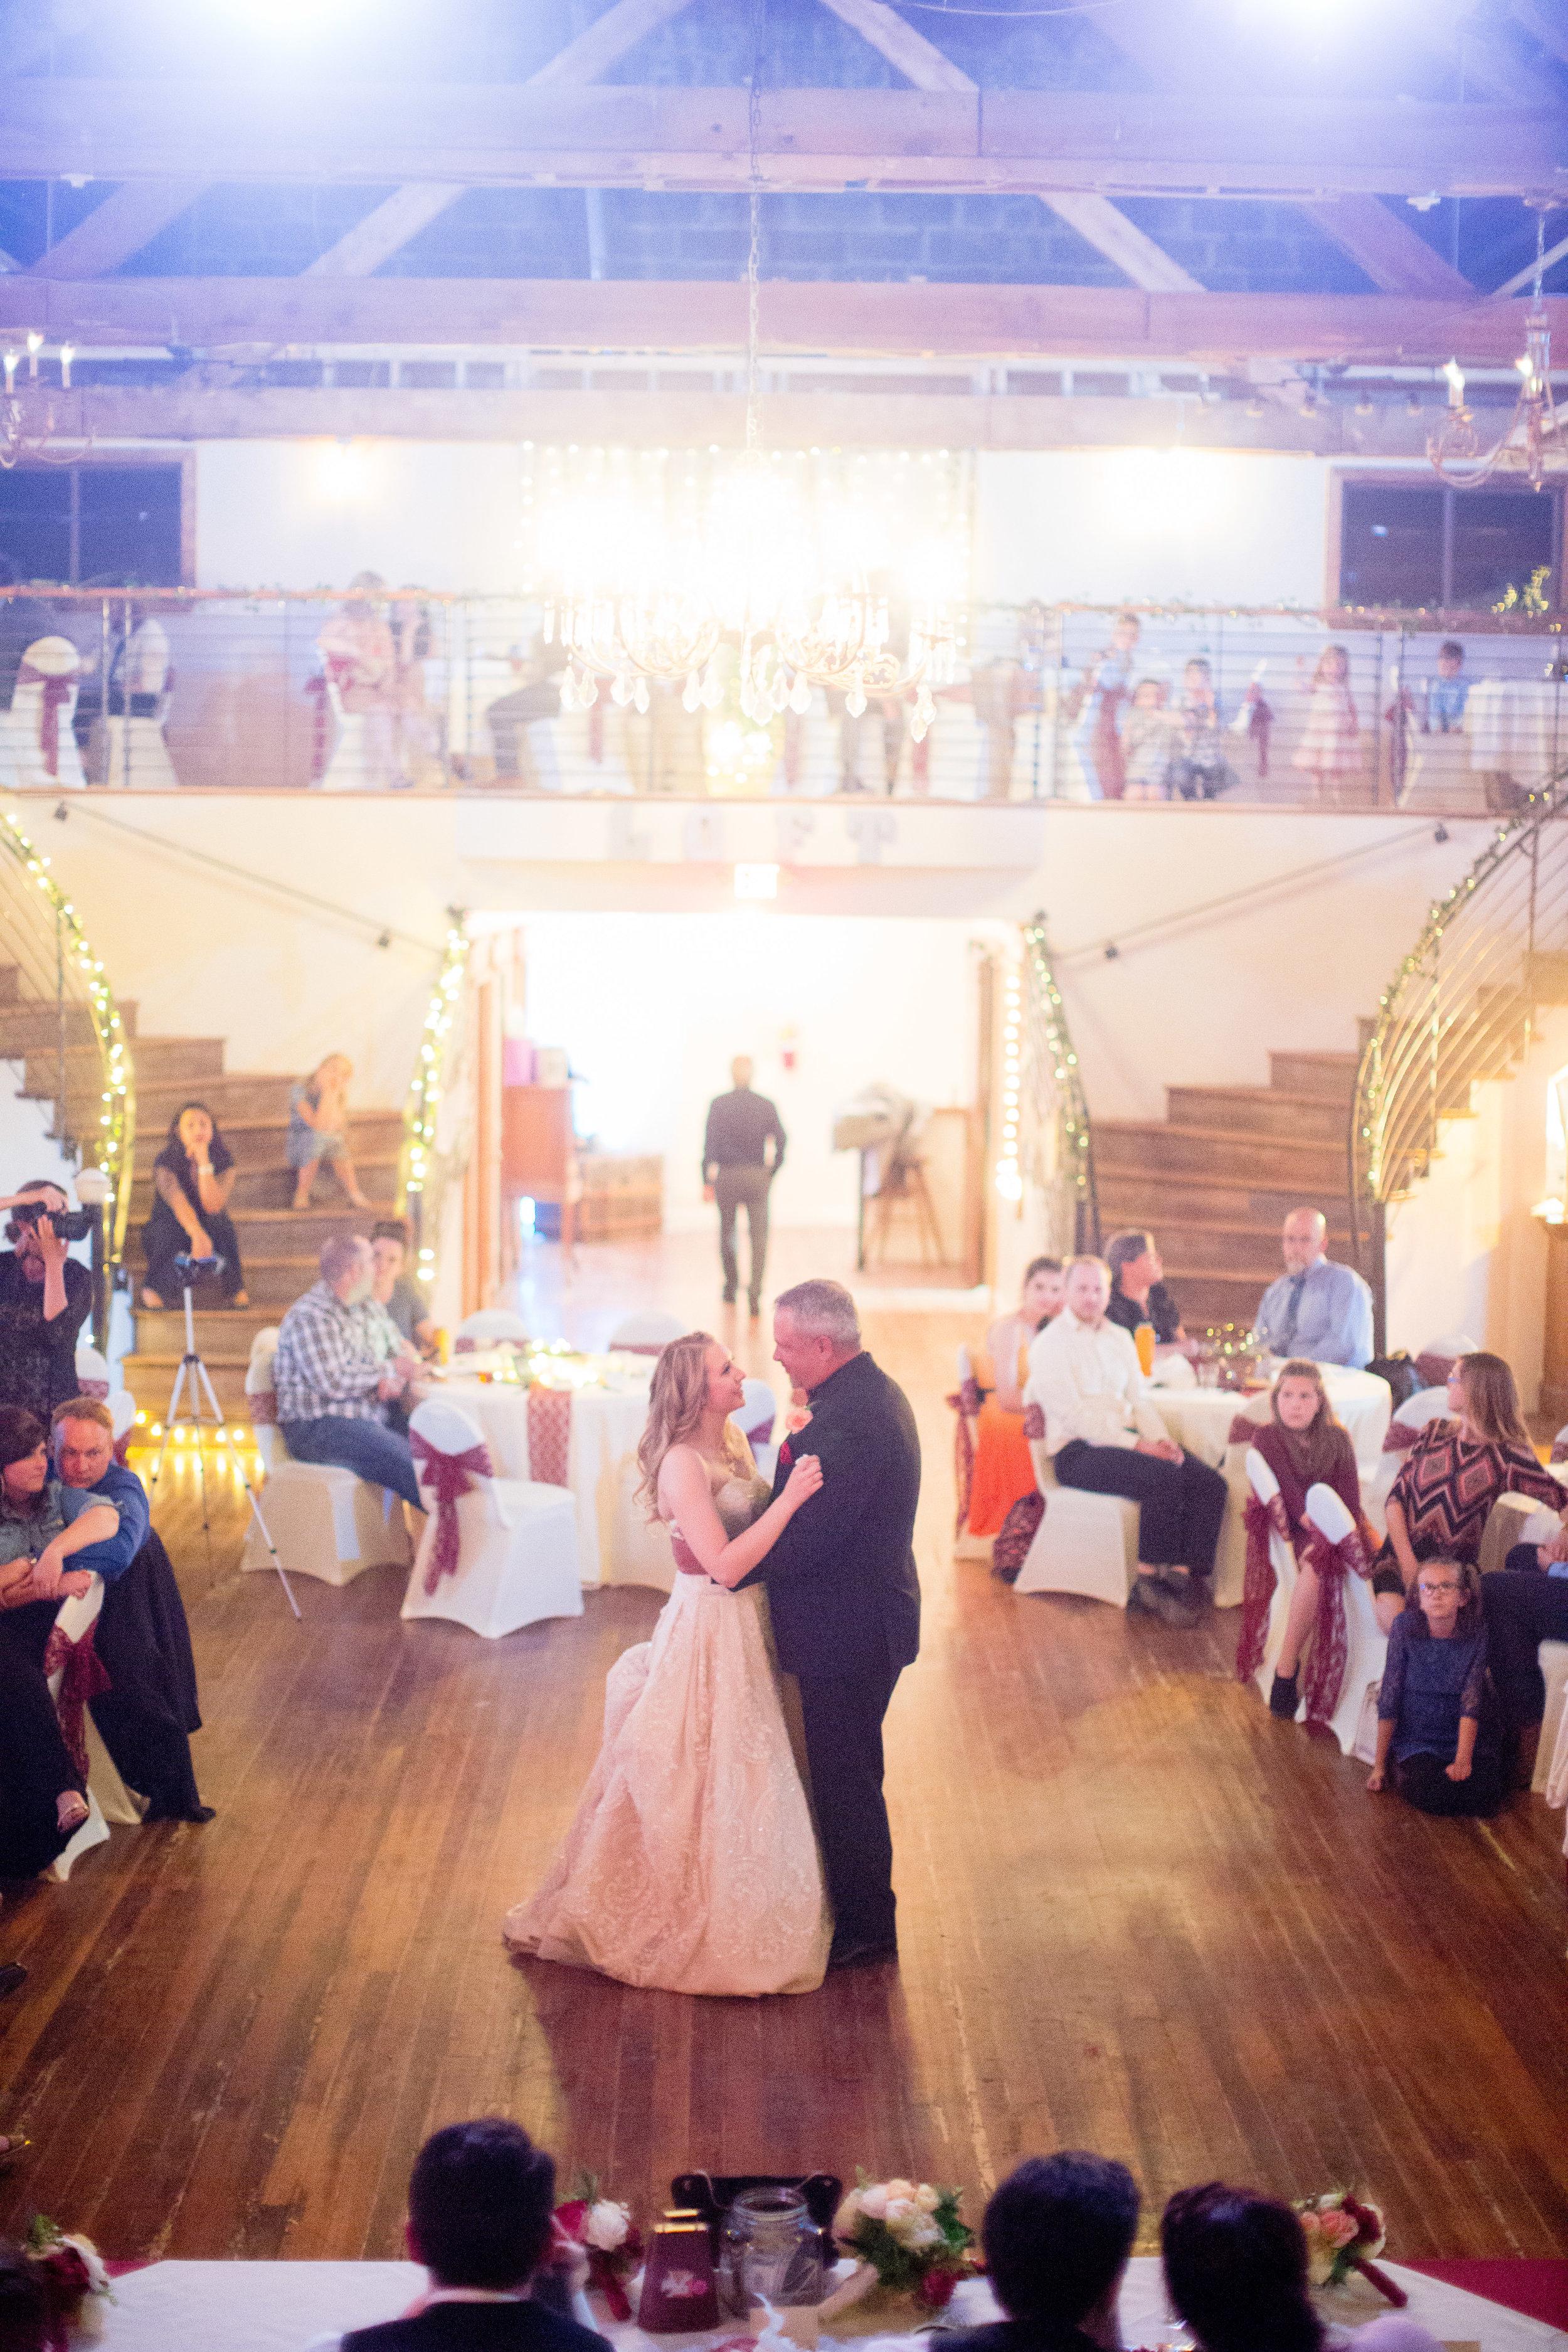 WEDDING AT THE LOFT ORPHEUM THEATER AT BV